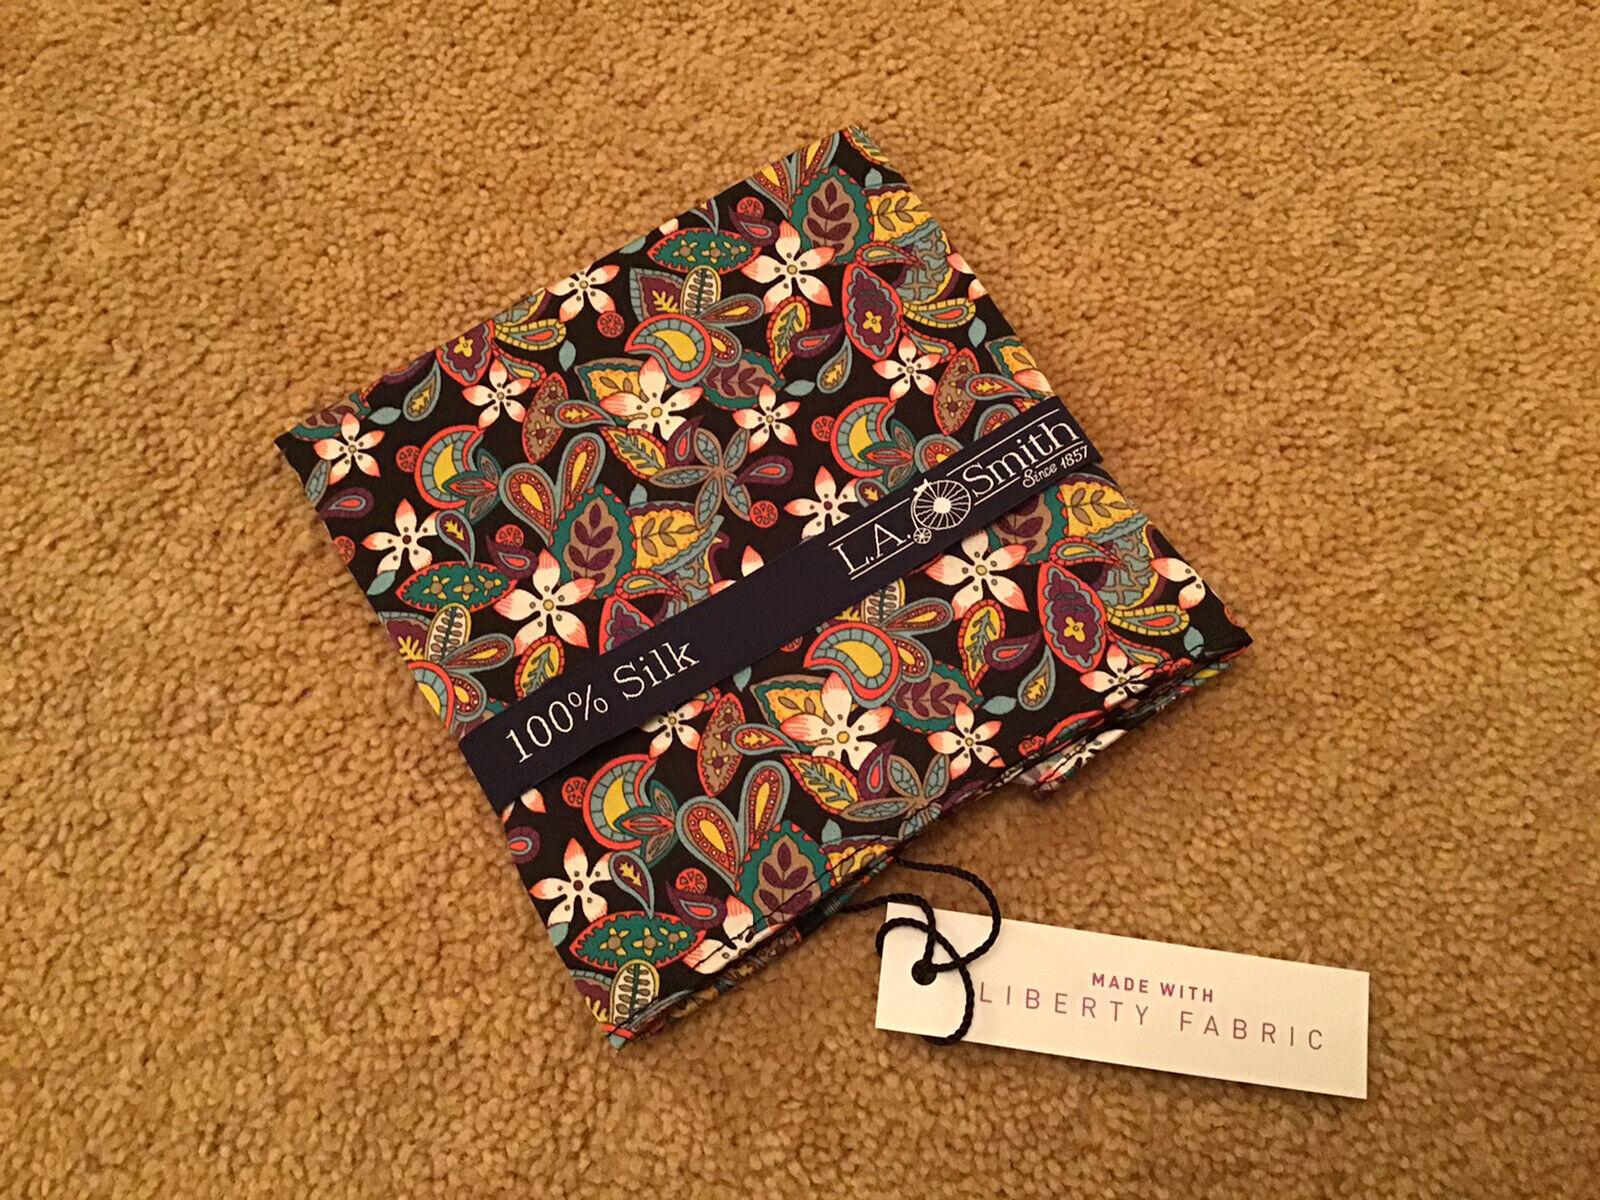 100% Pure Silk Floral Liberty Fabric Pocket Square.